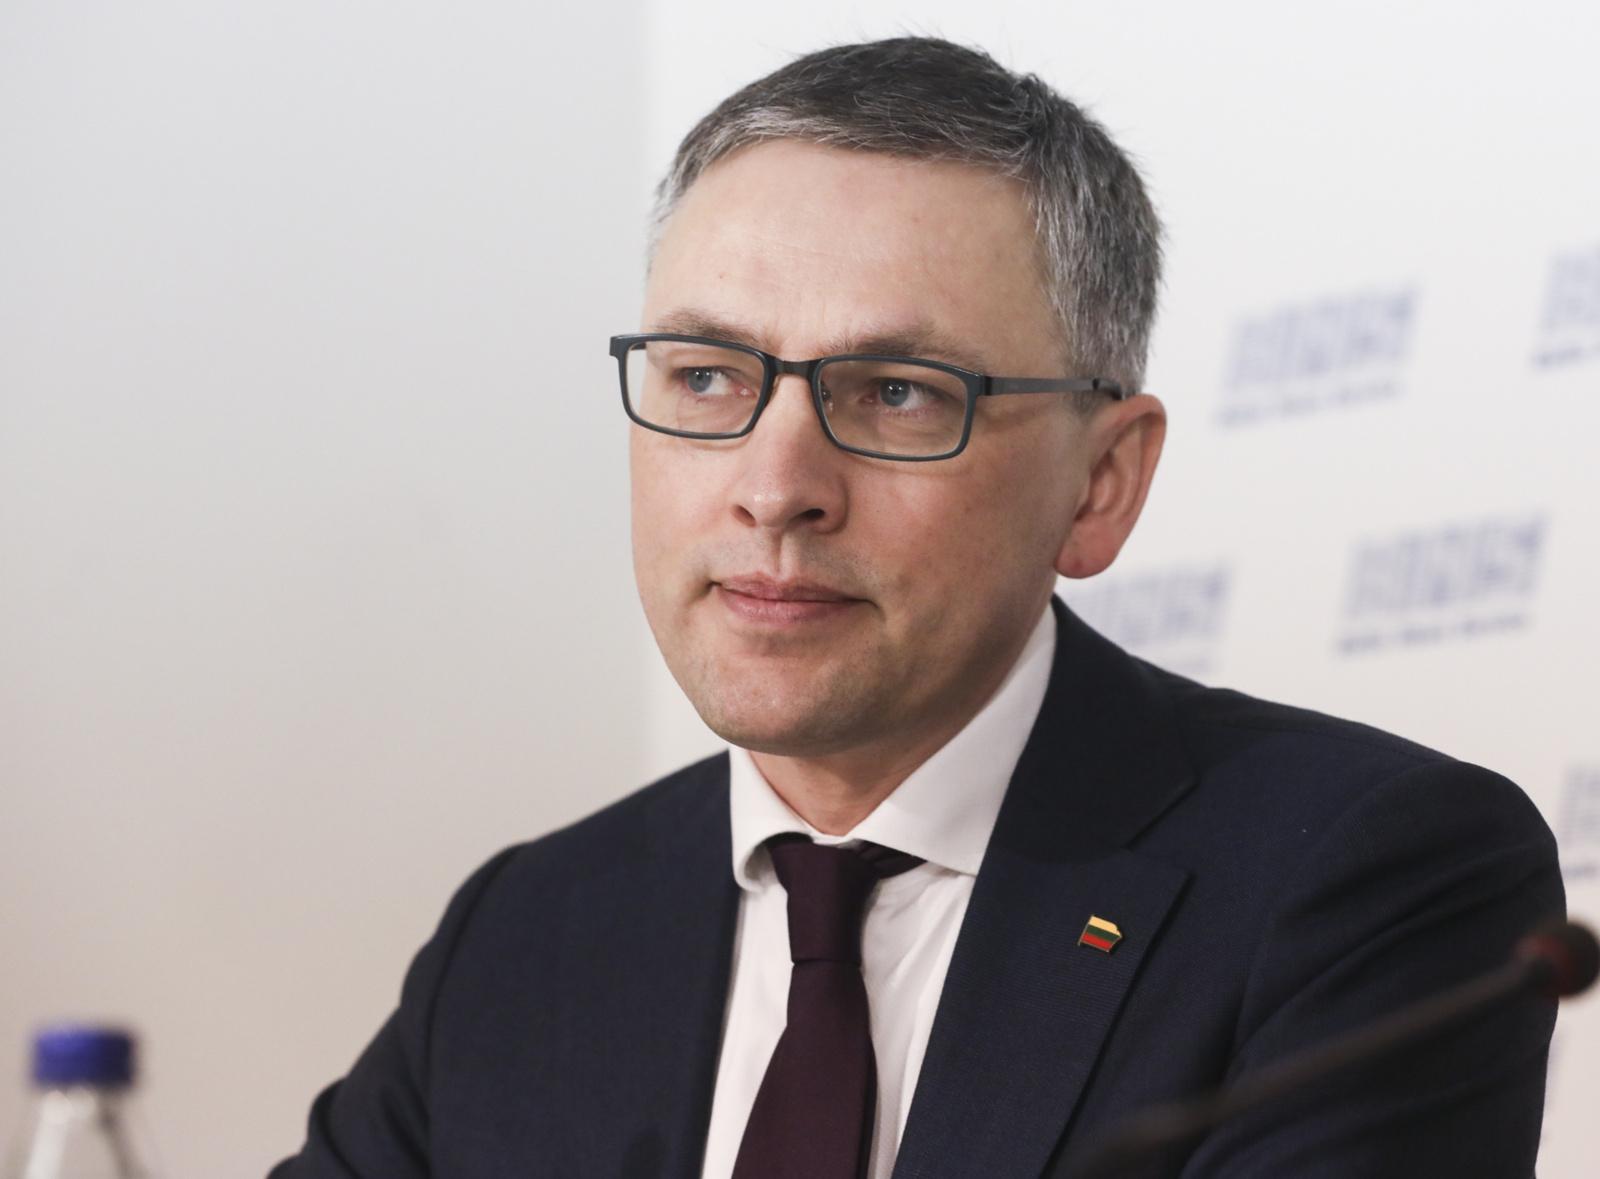 Seimo NSGK prašys V. Pranckiečio iš V. Bako atimti leidimą dirbti su slapta informacija